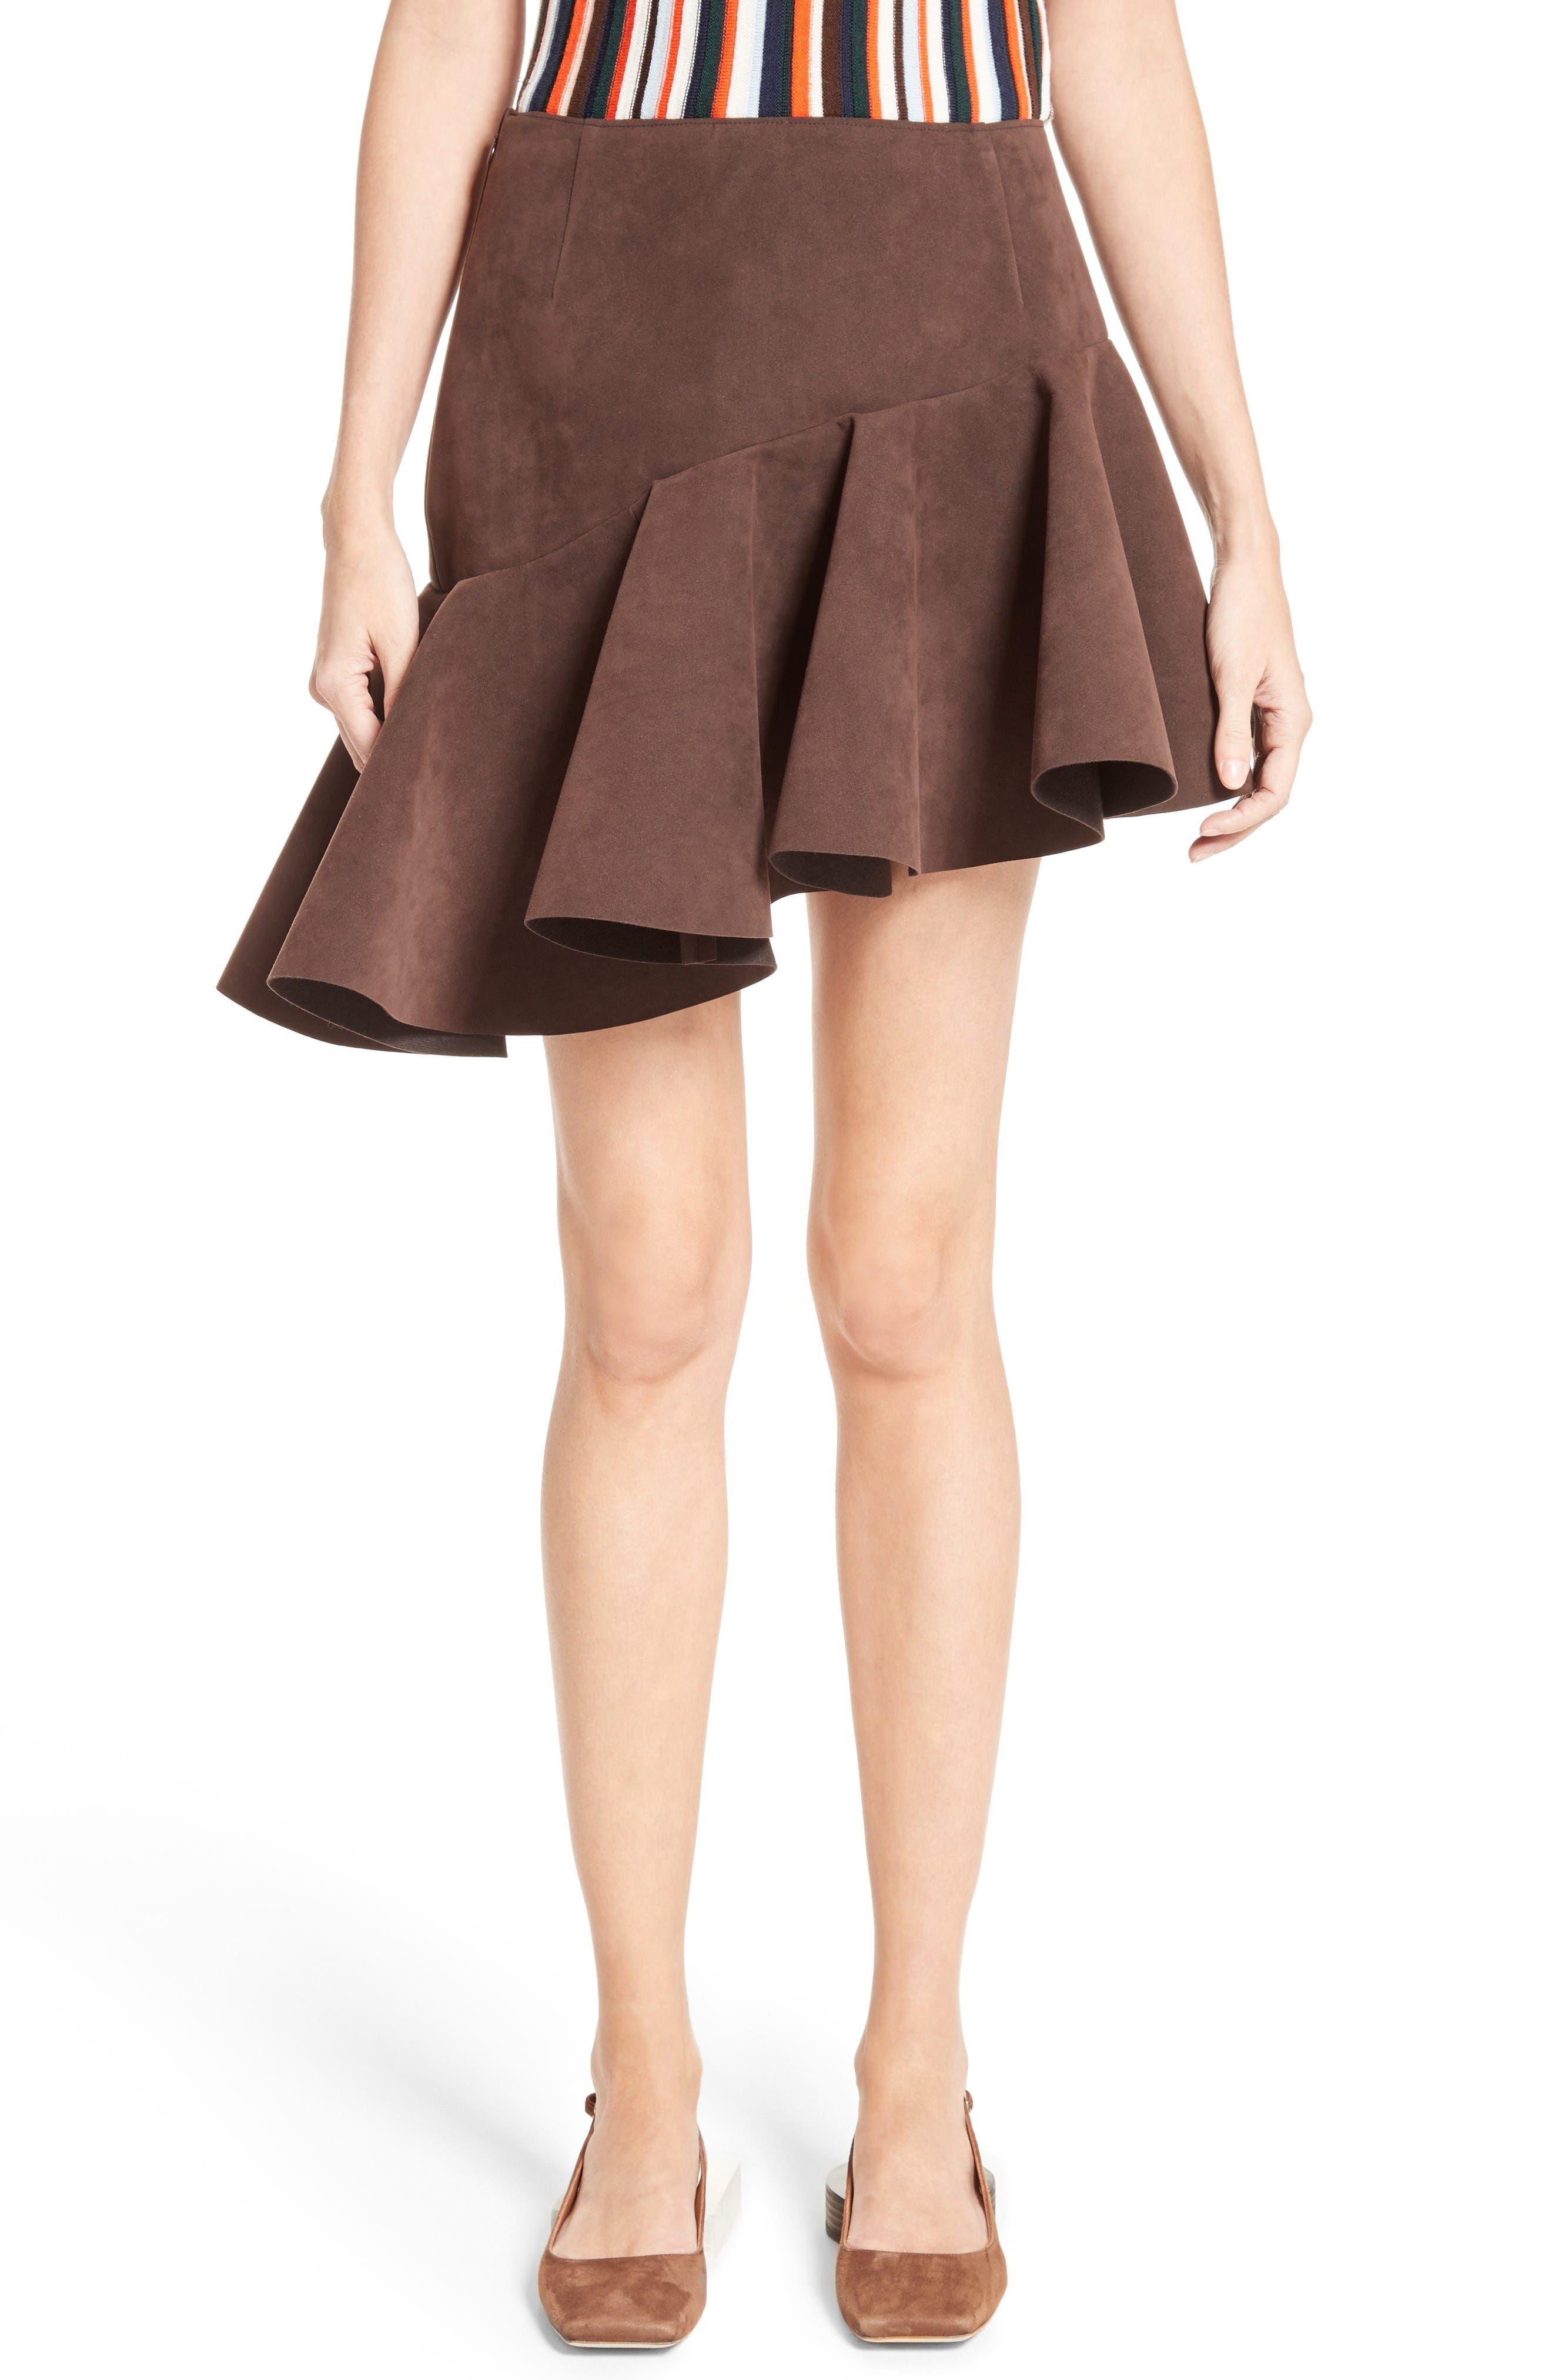 Jacquemus Camargue Skirt